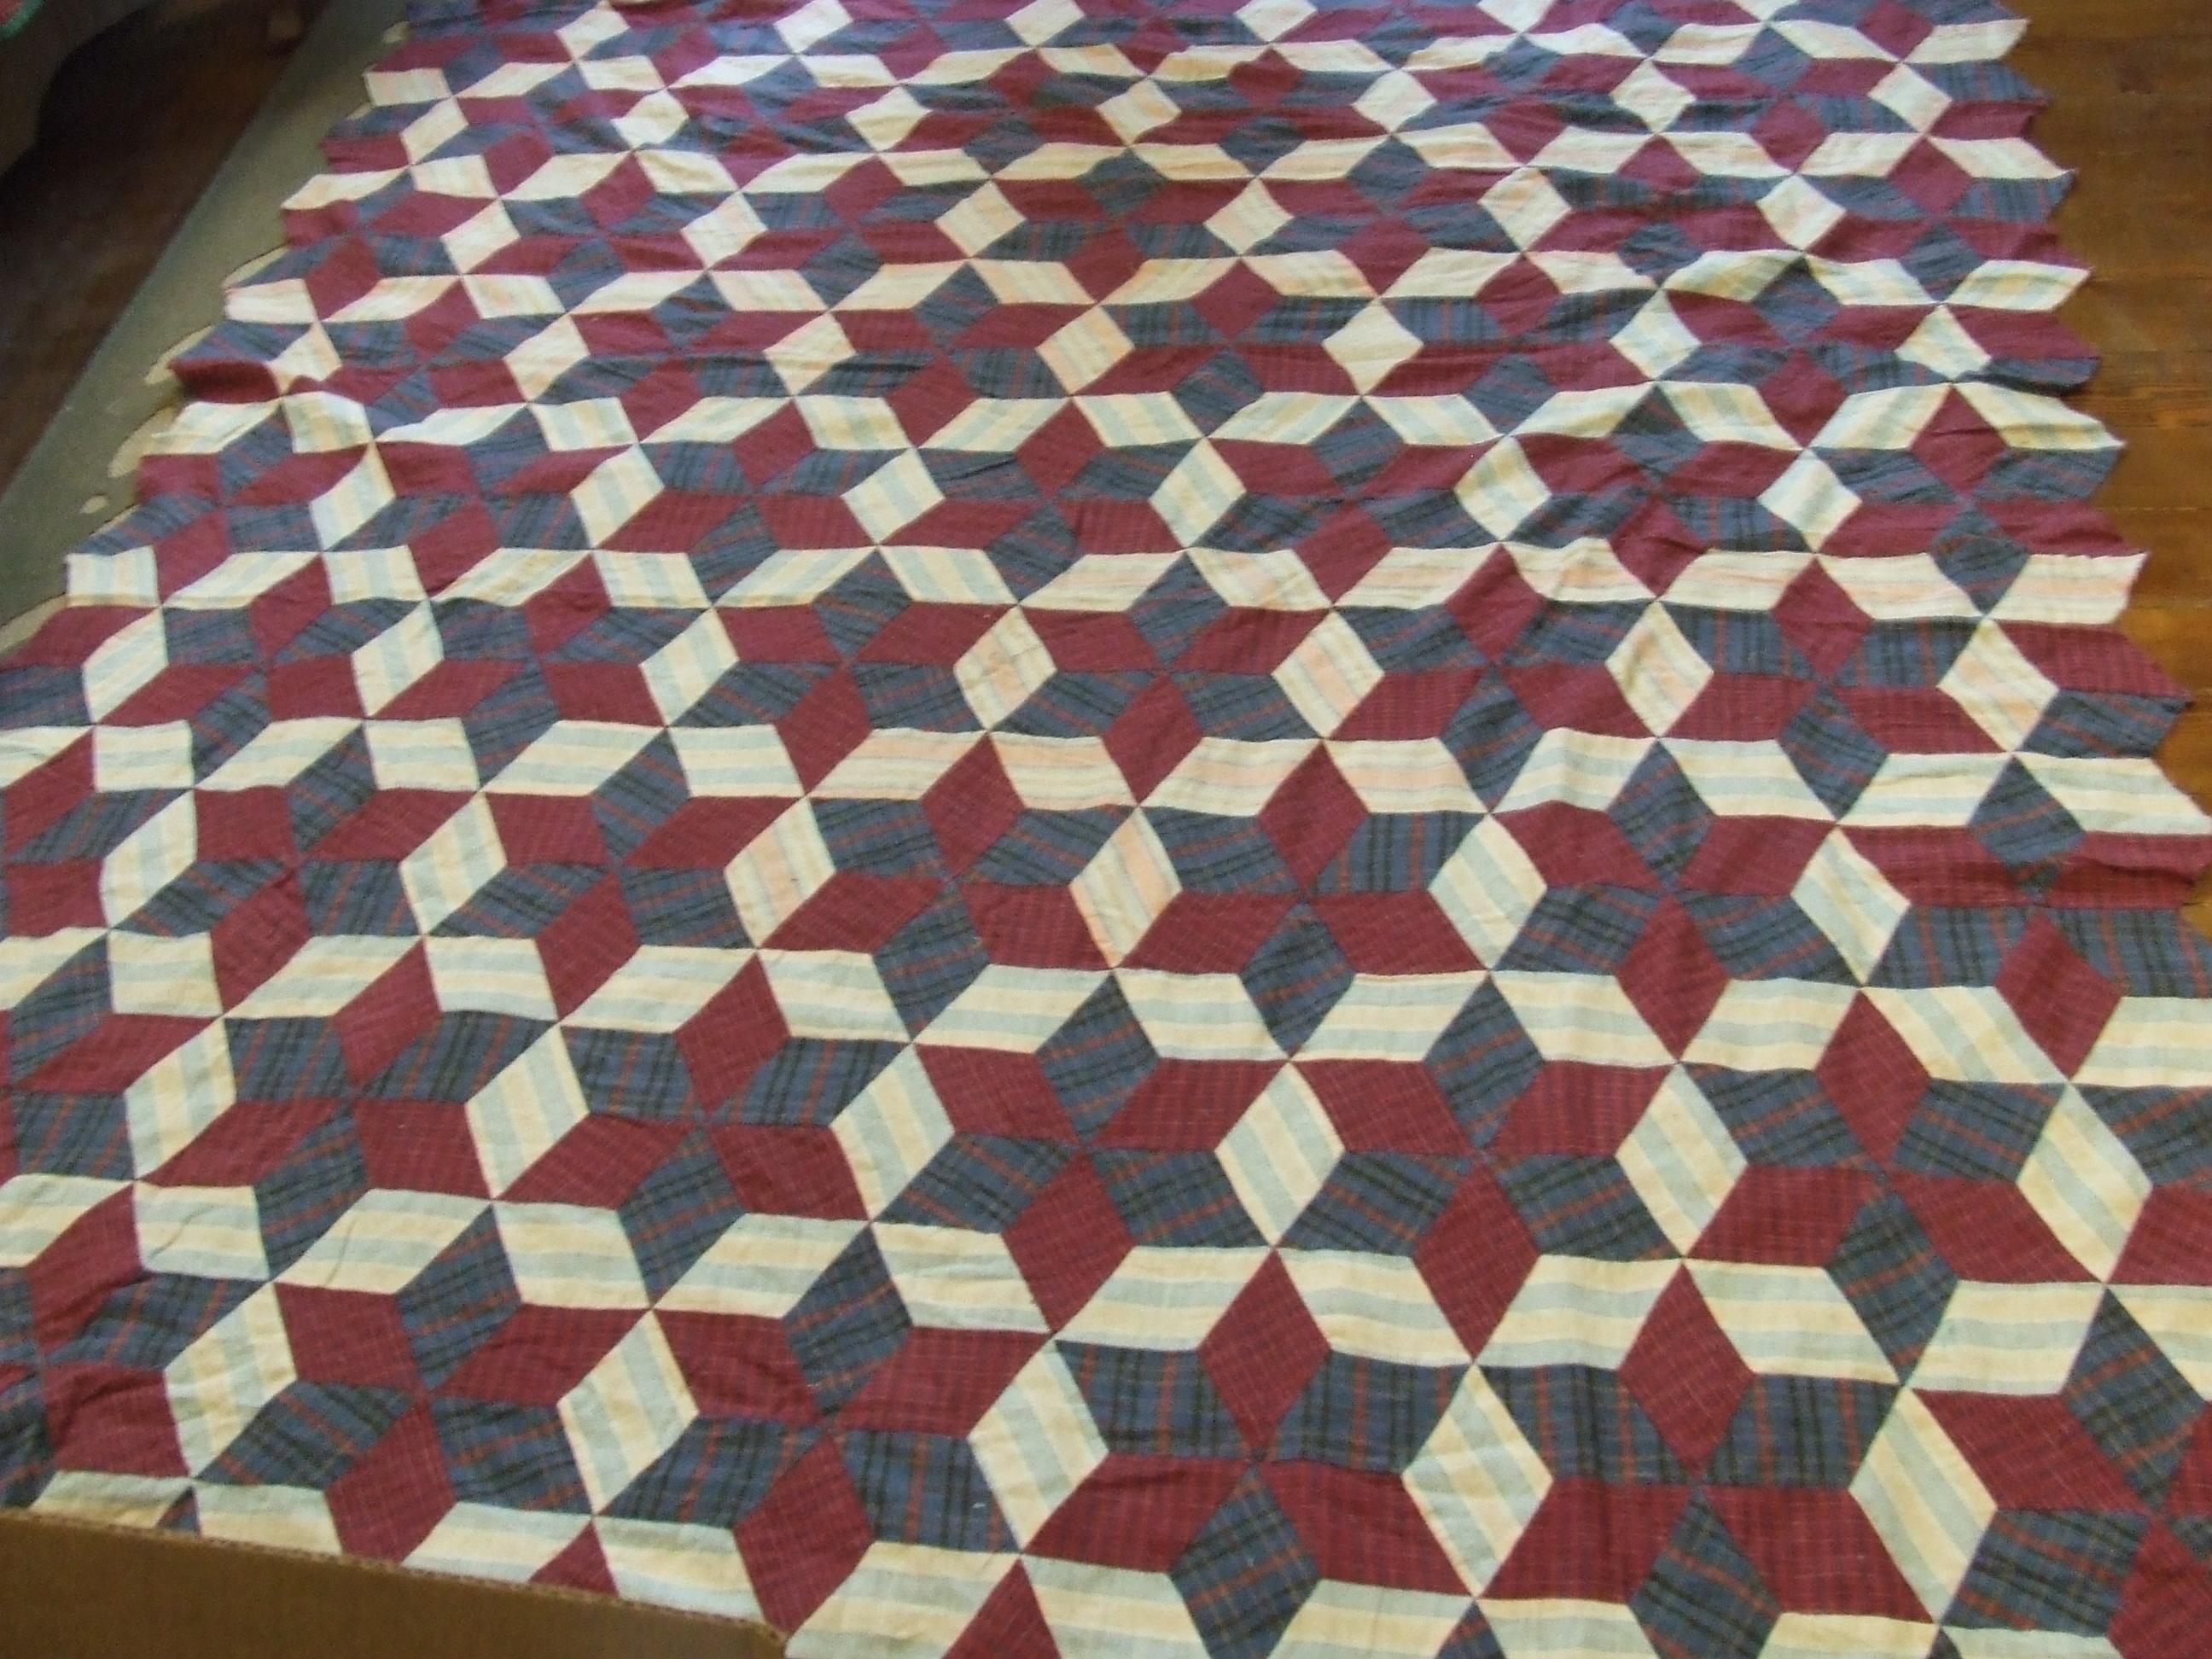 Quilt Patterns For A Man : Flannel Tumbling blocks / hexagonal star Tim Latimer - Quilts etc